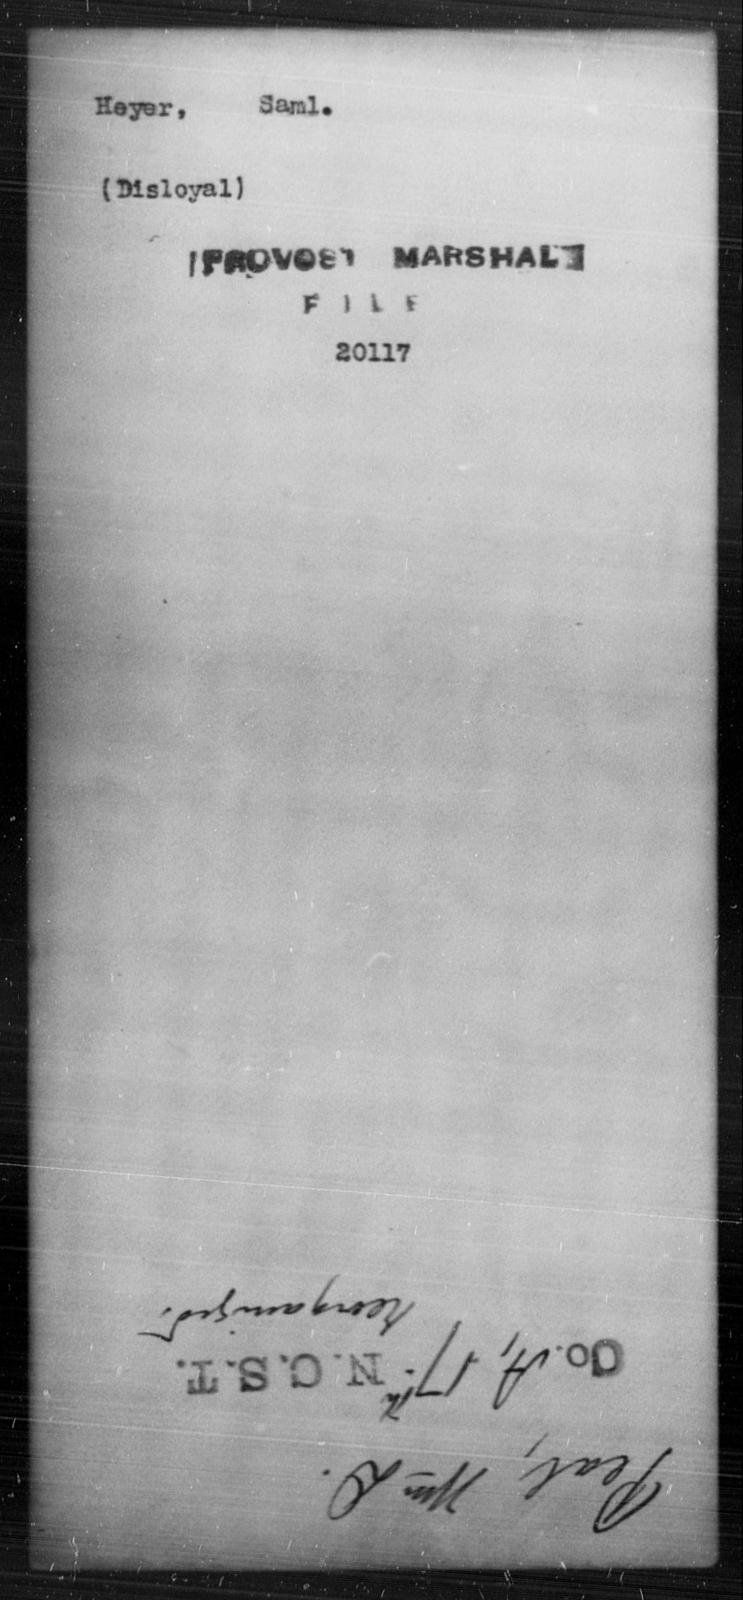 Heyer, Saml - State: [Blank] - Year: [Blank]